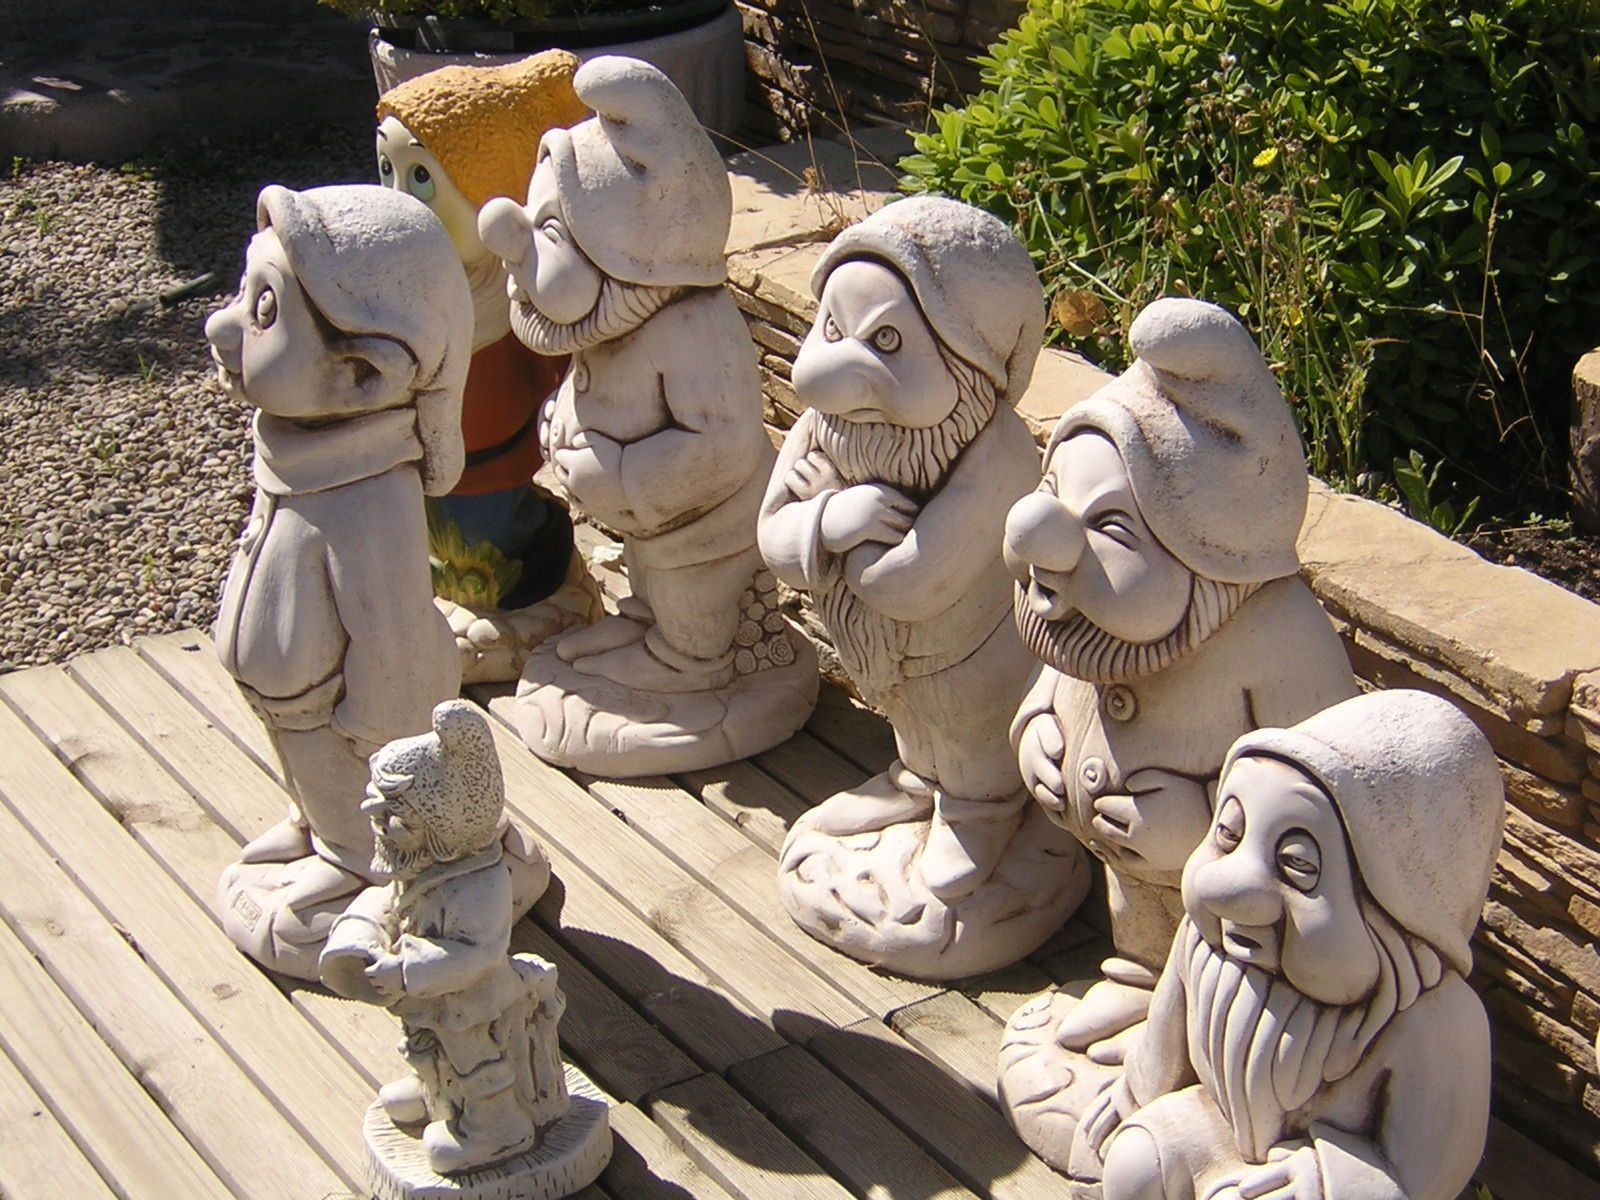 Esculturas de jardin blog garden center ejea - Esculturas para jardines ...